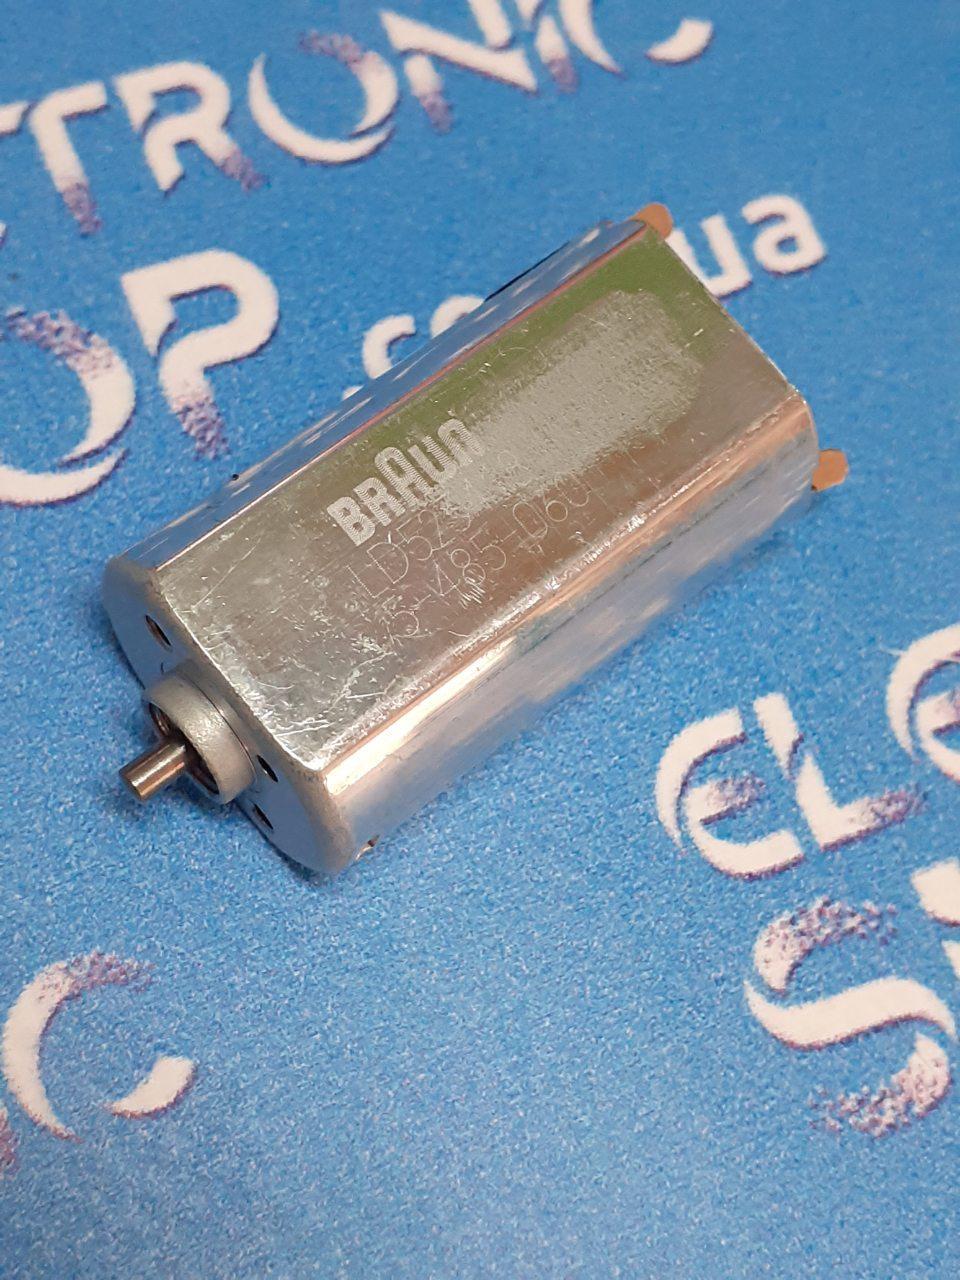 Двигатель микромотор к электробритве Braun 5730 LD523413 оригинал  б.у